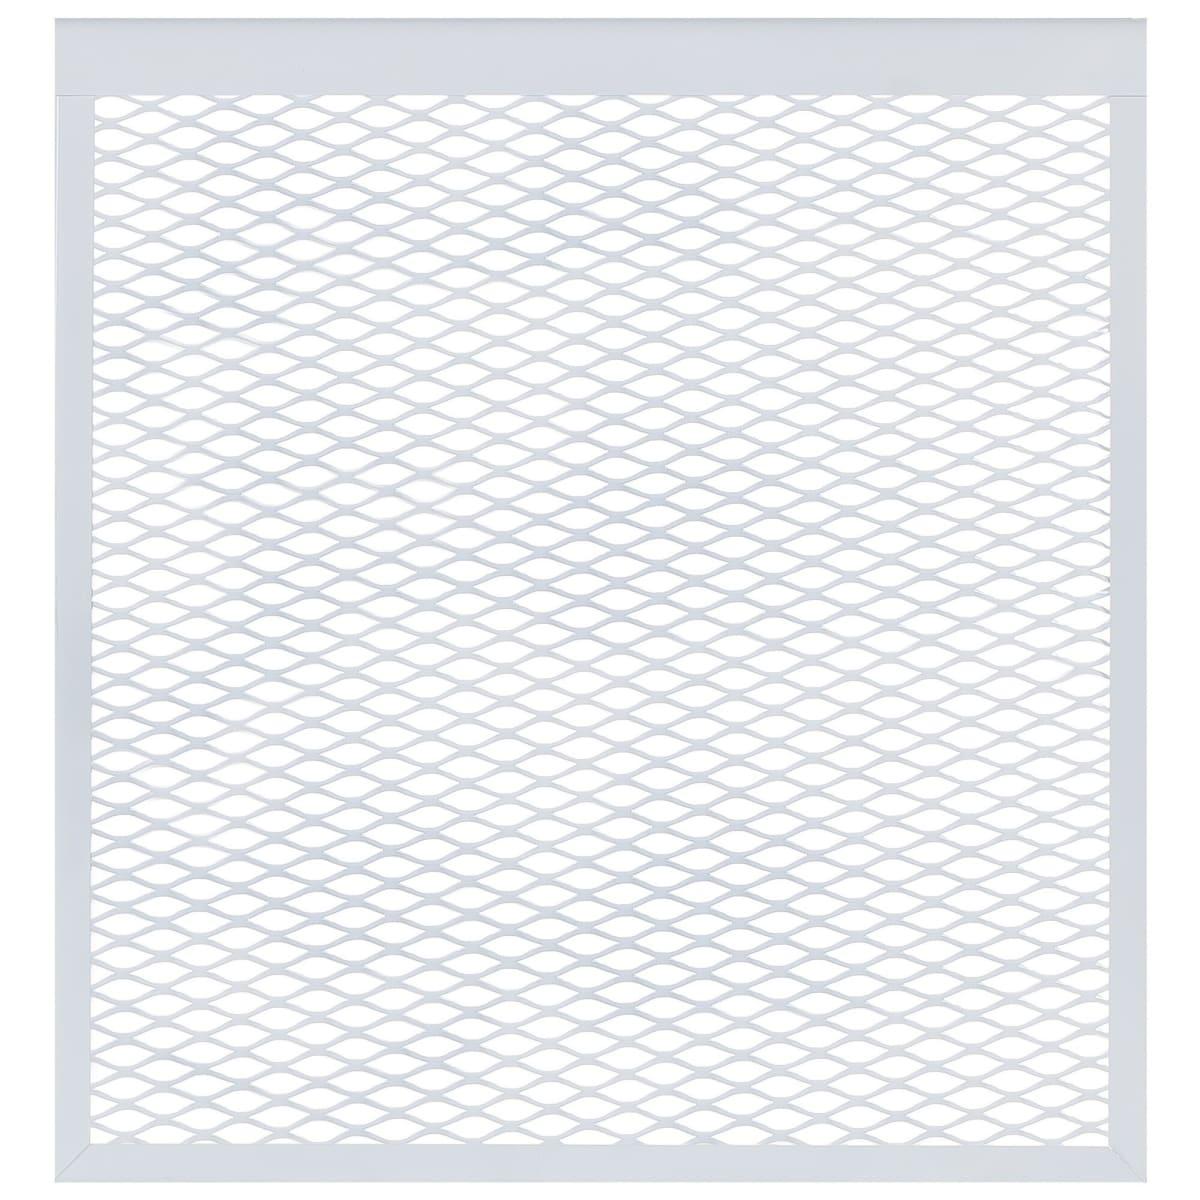 Декоративная панель 6 секция 620x620 мм